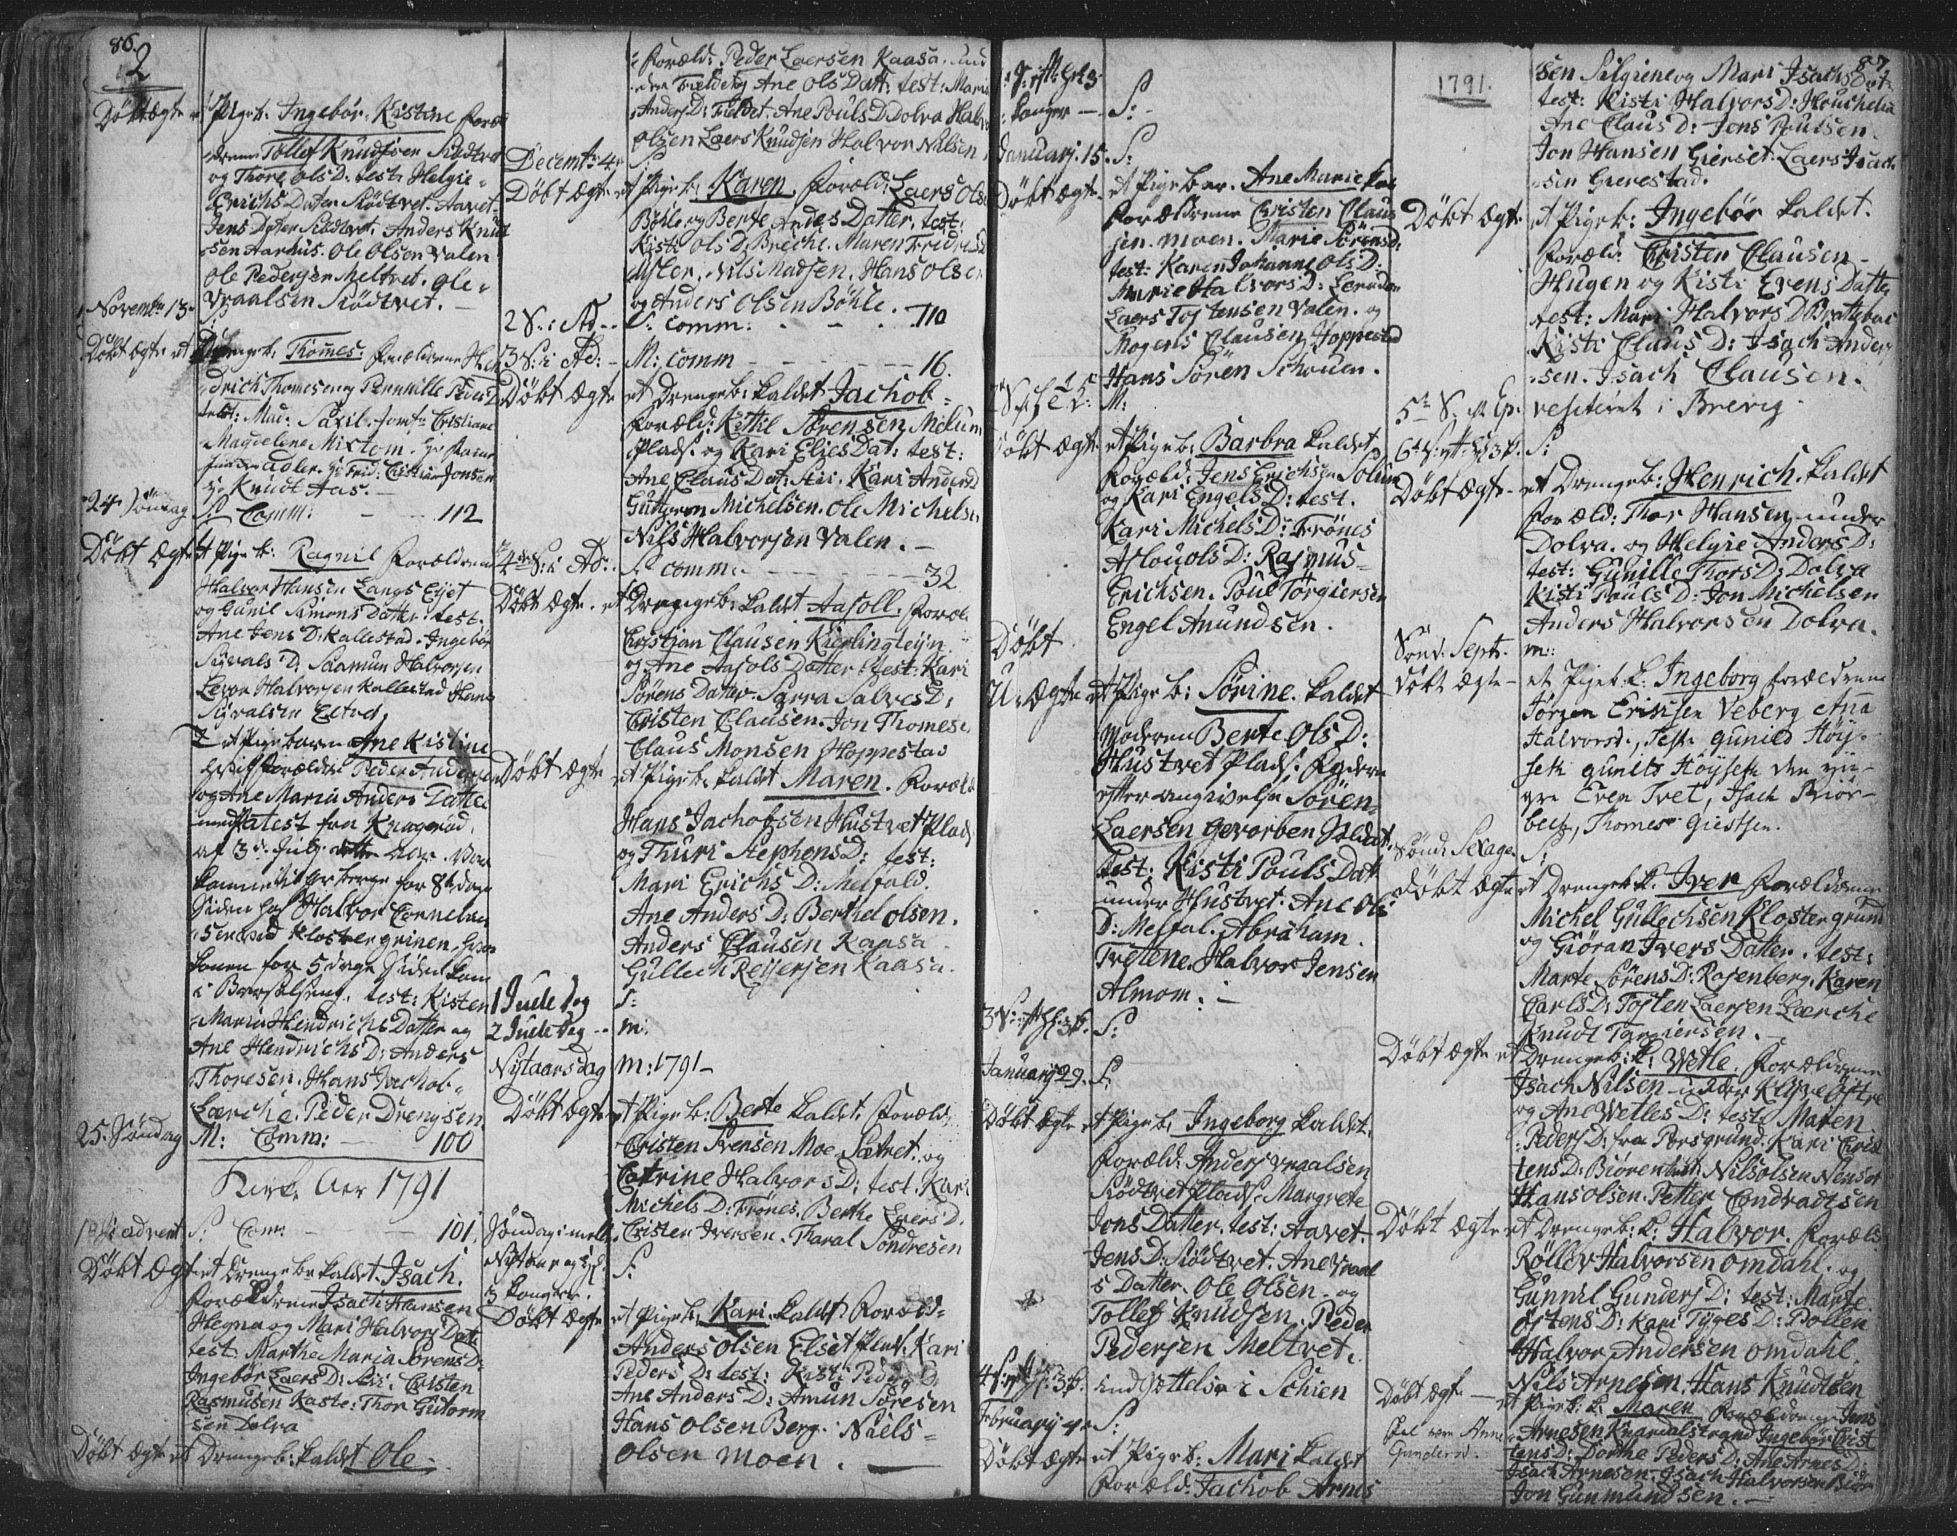 SAKO, Solum kirkebøker, F/Fa/L0003: Ministerialbok nr. I 3, 1761-1814, s. 86-87